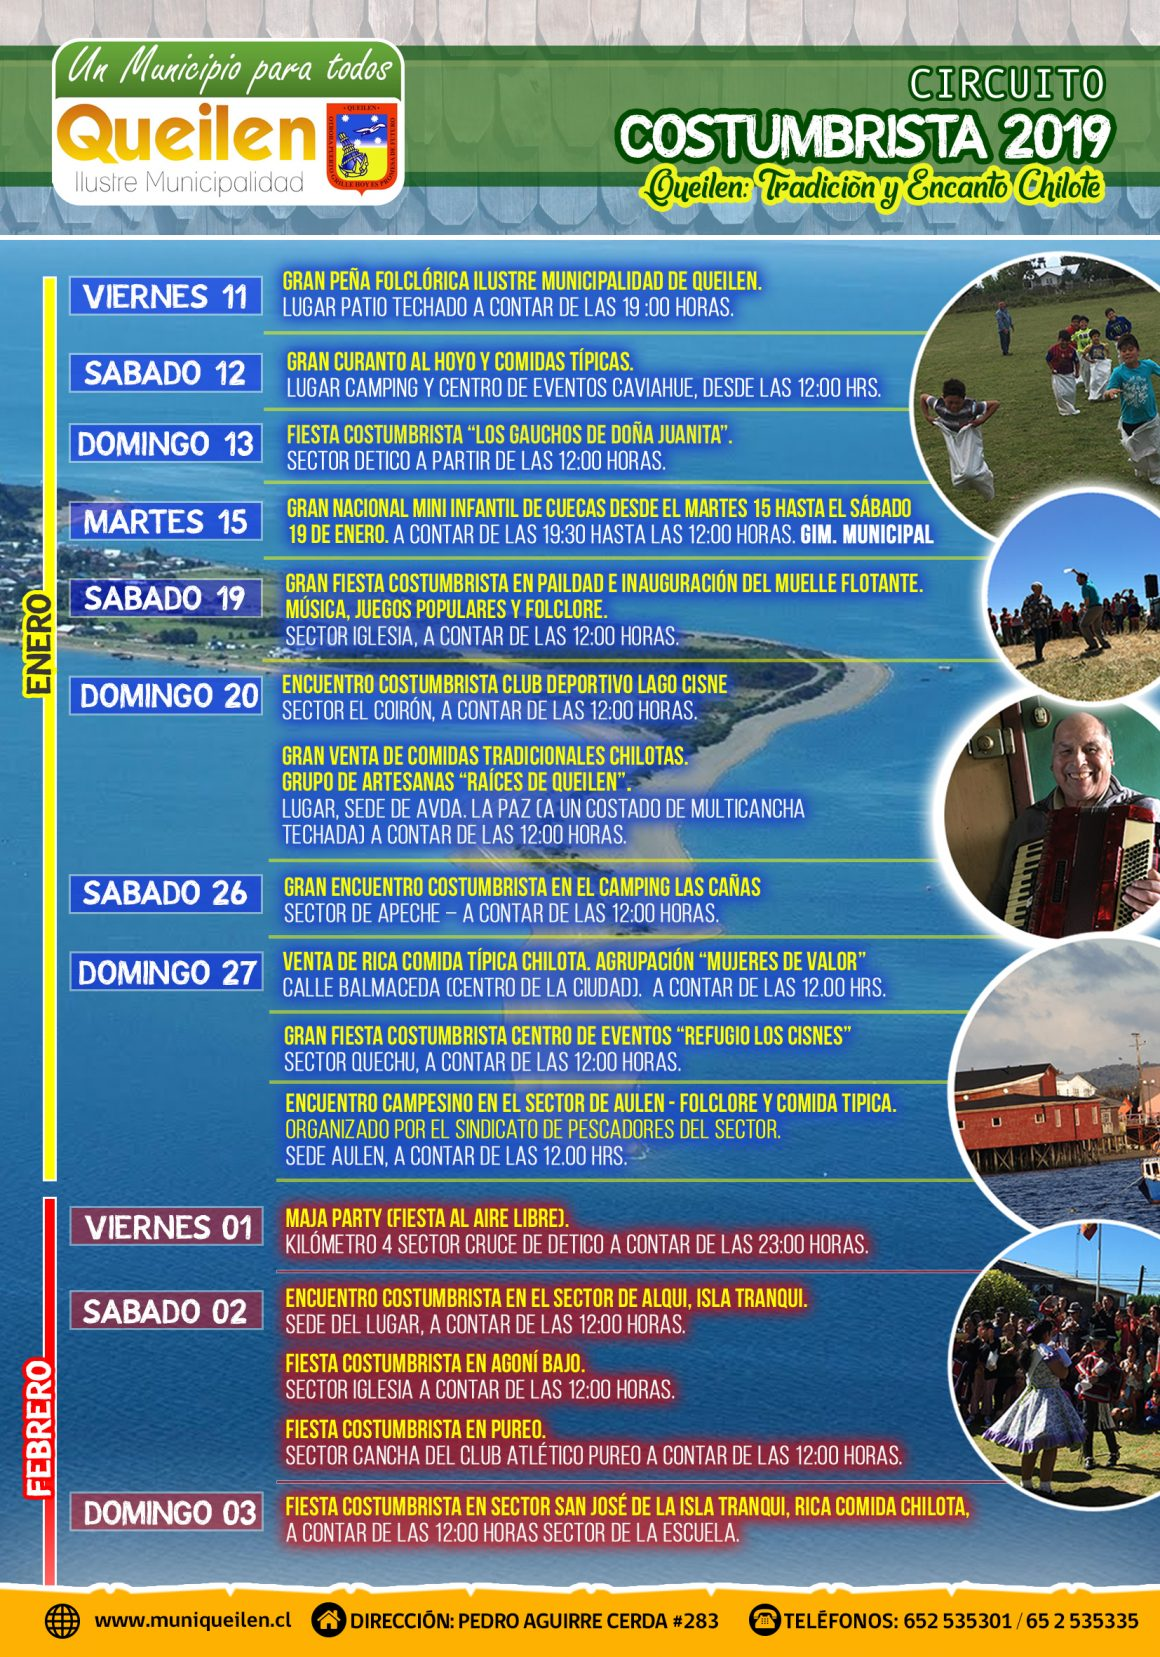 CIRCUITO COSTUMBRISTA 2019, QUEILEN TRADICIÓN Y ENCANTO CHILOTE